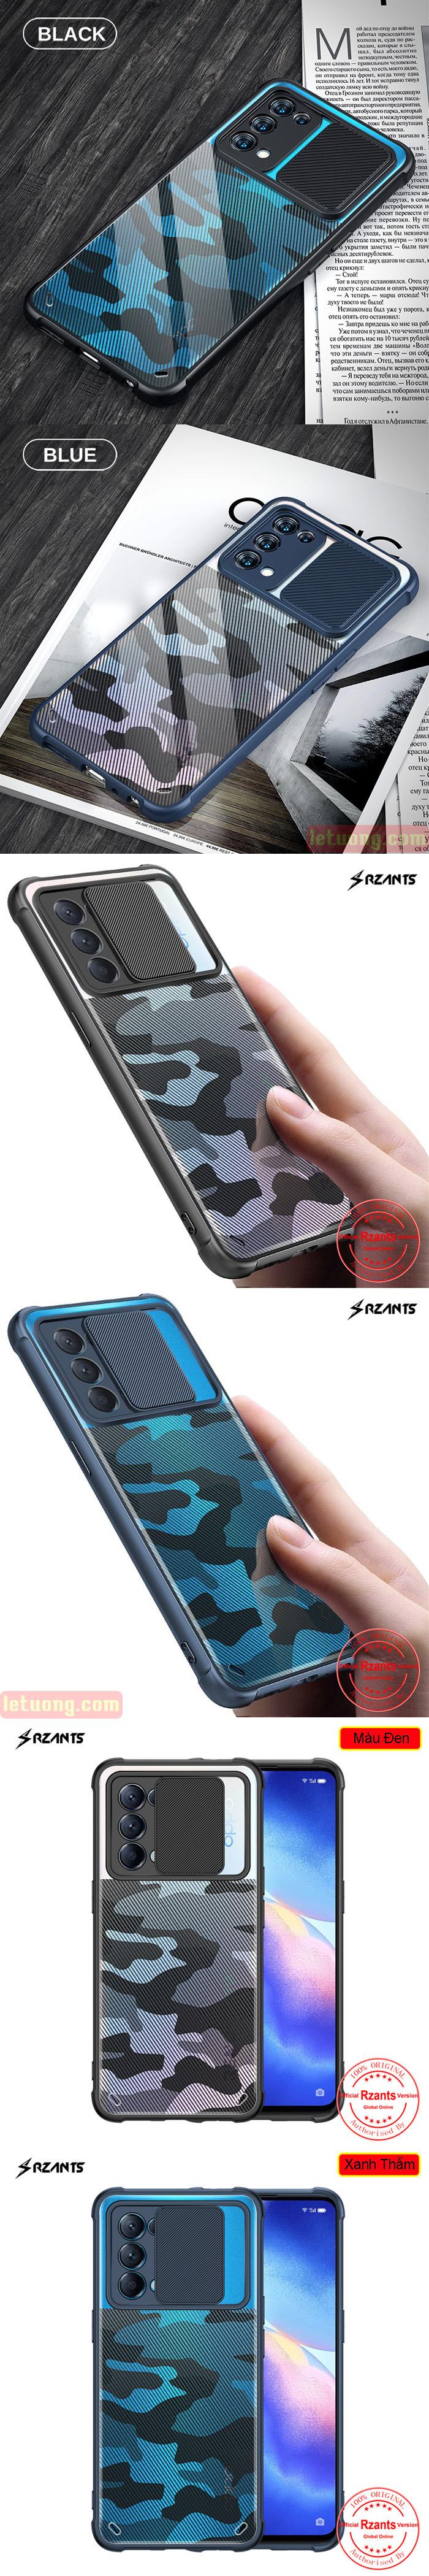 Ốp lưng Oppo Reno 5, Reno5 5G Rzants Camouflage Lens bảo vệ camera 6